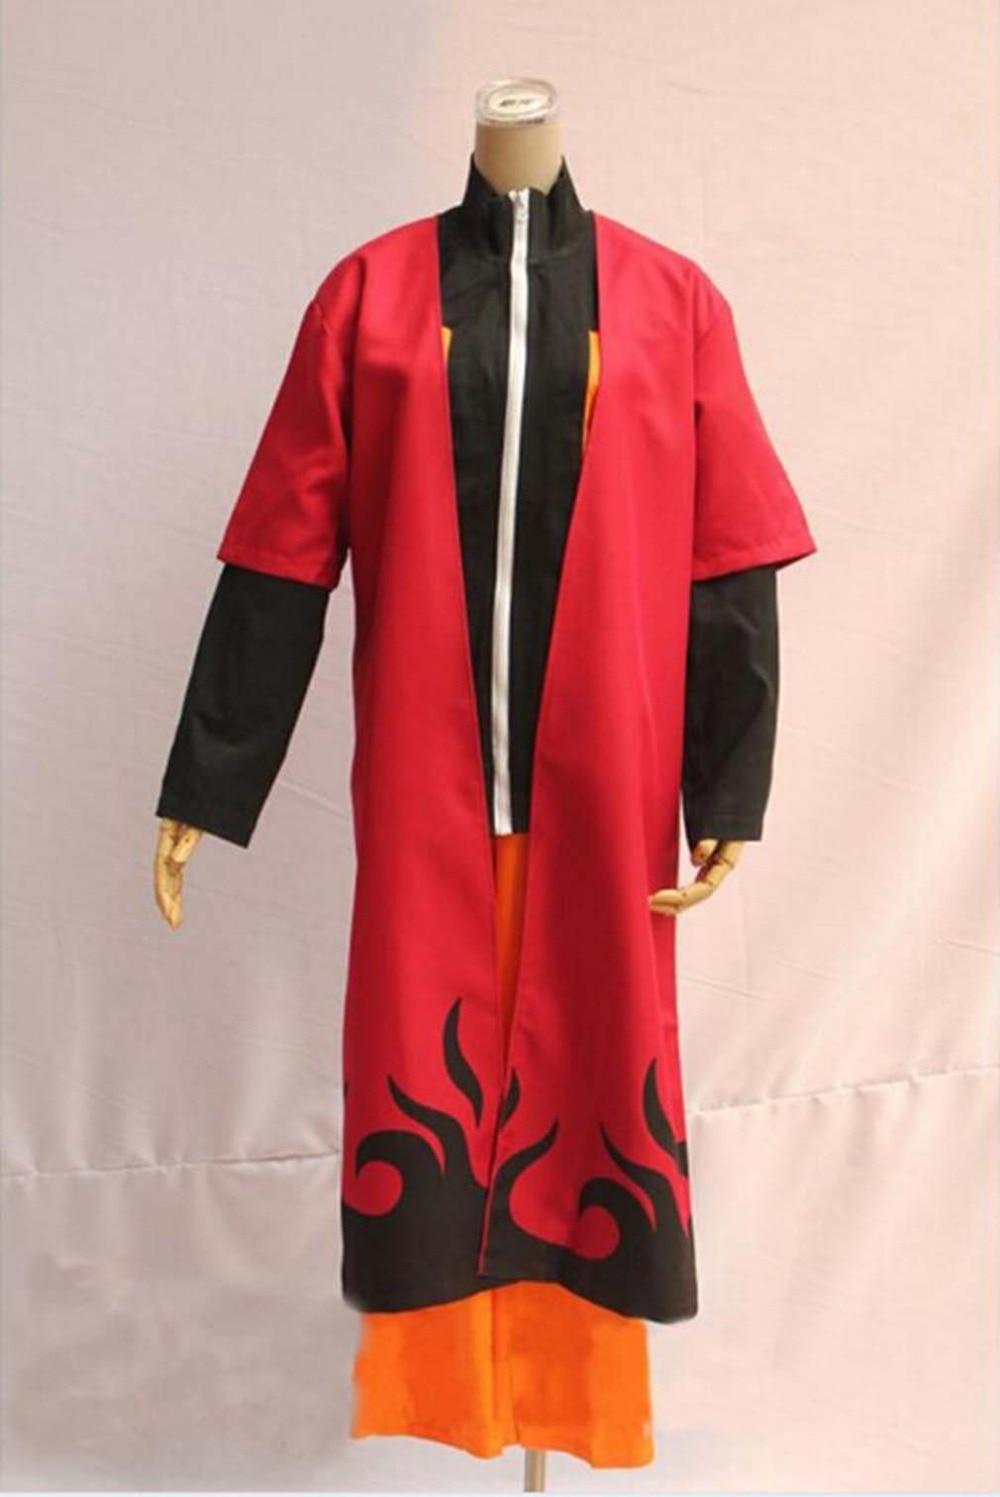 New Fashion Unisex Naruto Cosplay Costumes Japan Anime Uzumaki Naruto Cosplay Robes Cool Man Cool Woman Cosplay Costumes